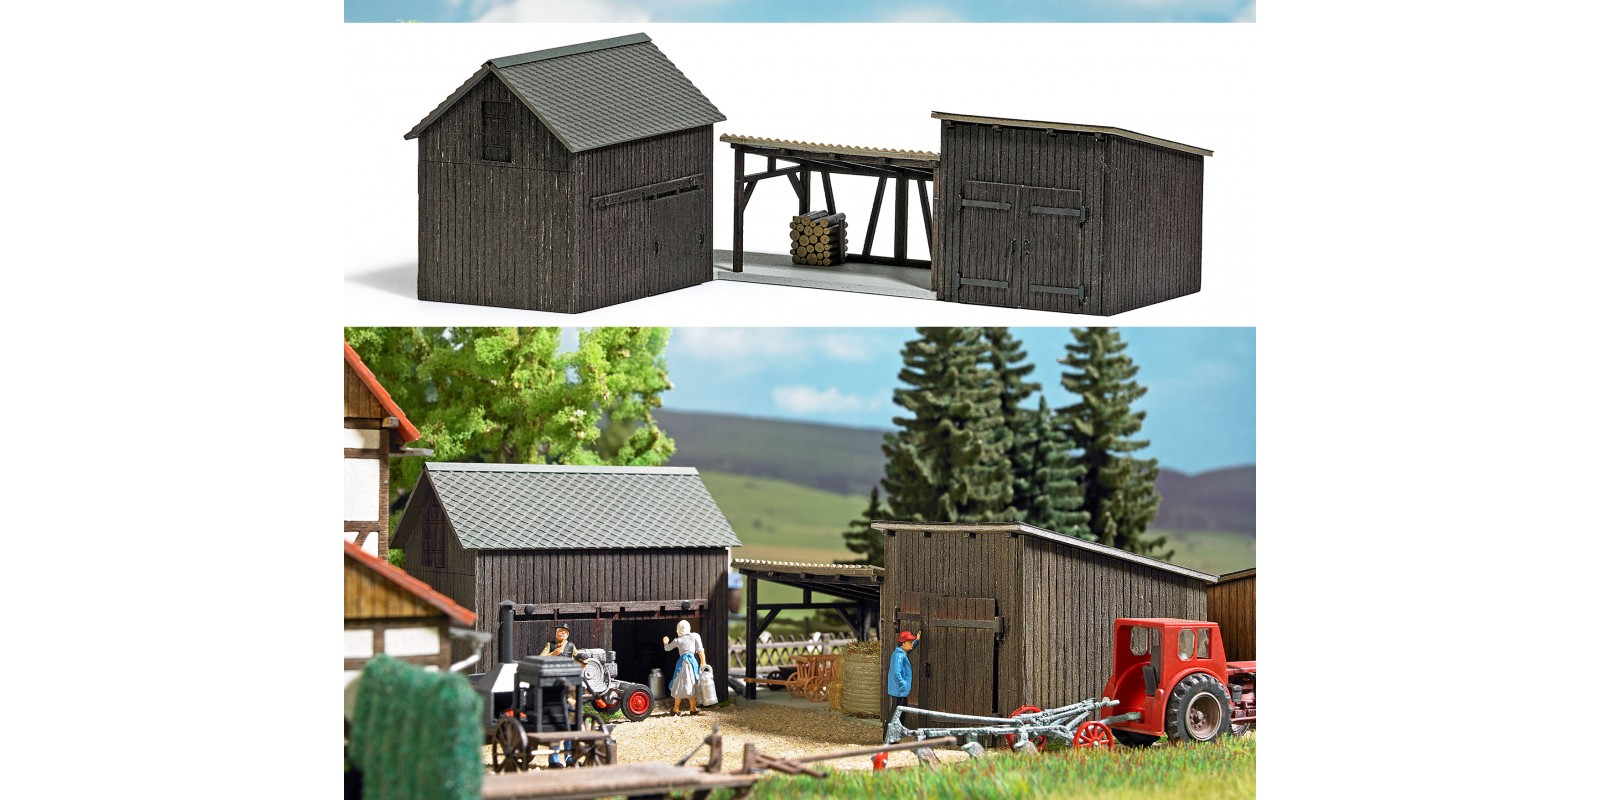 BU1595 Wooden Sheds and Shelter